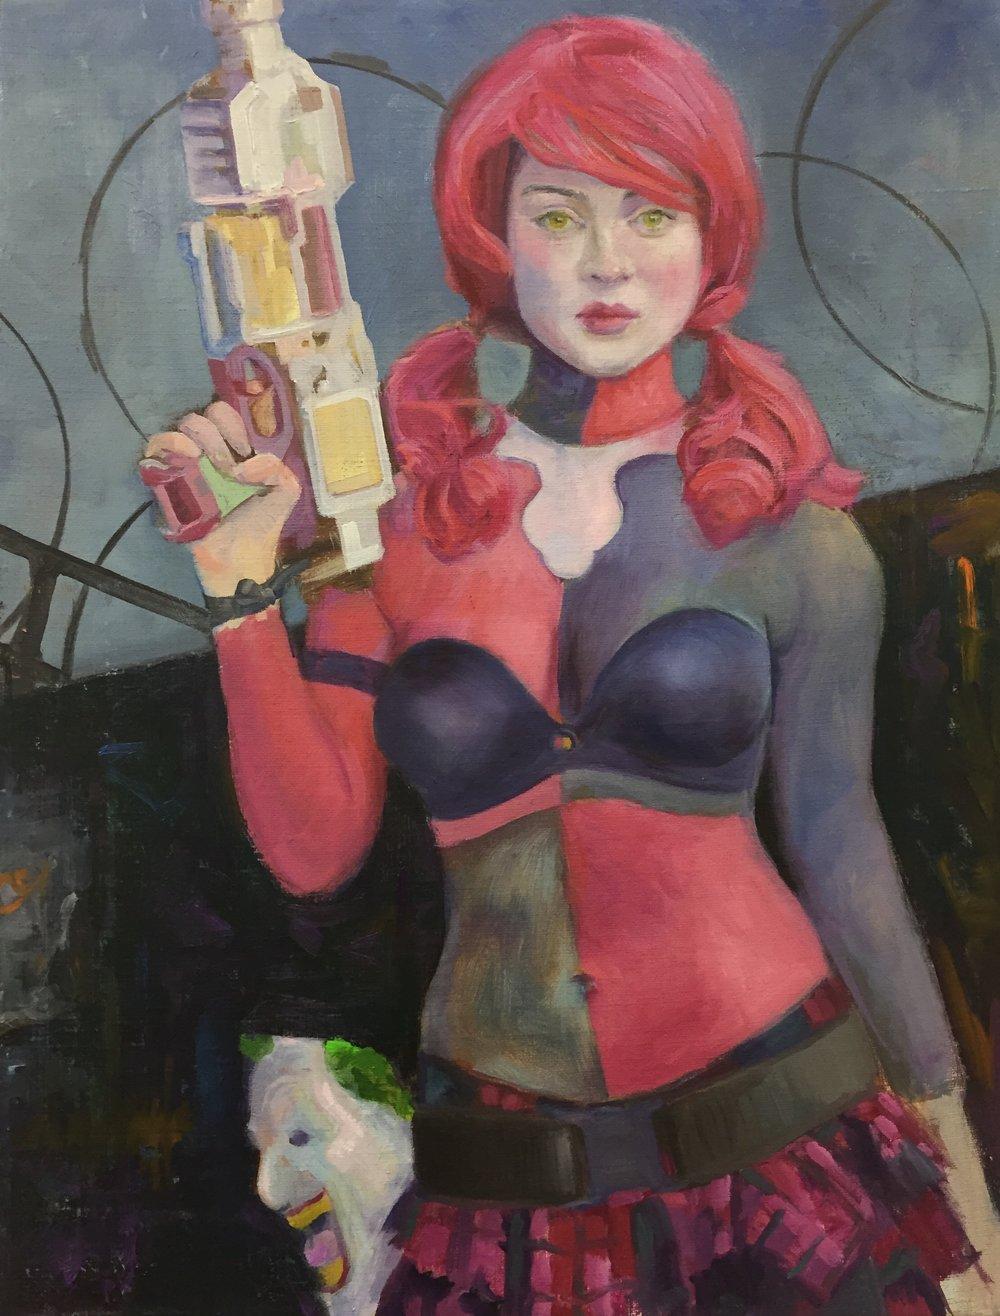 """Comicon Harlequin"", 2018, 16x20"", Oil on Linen"